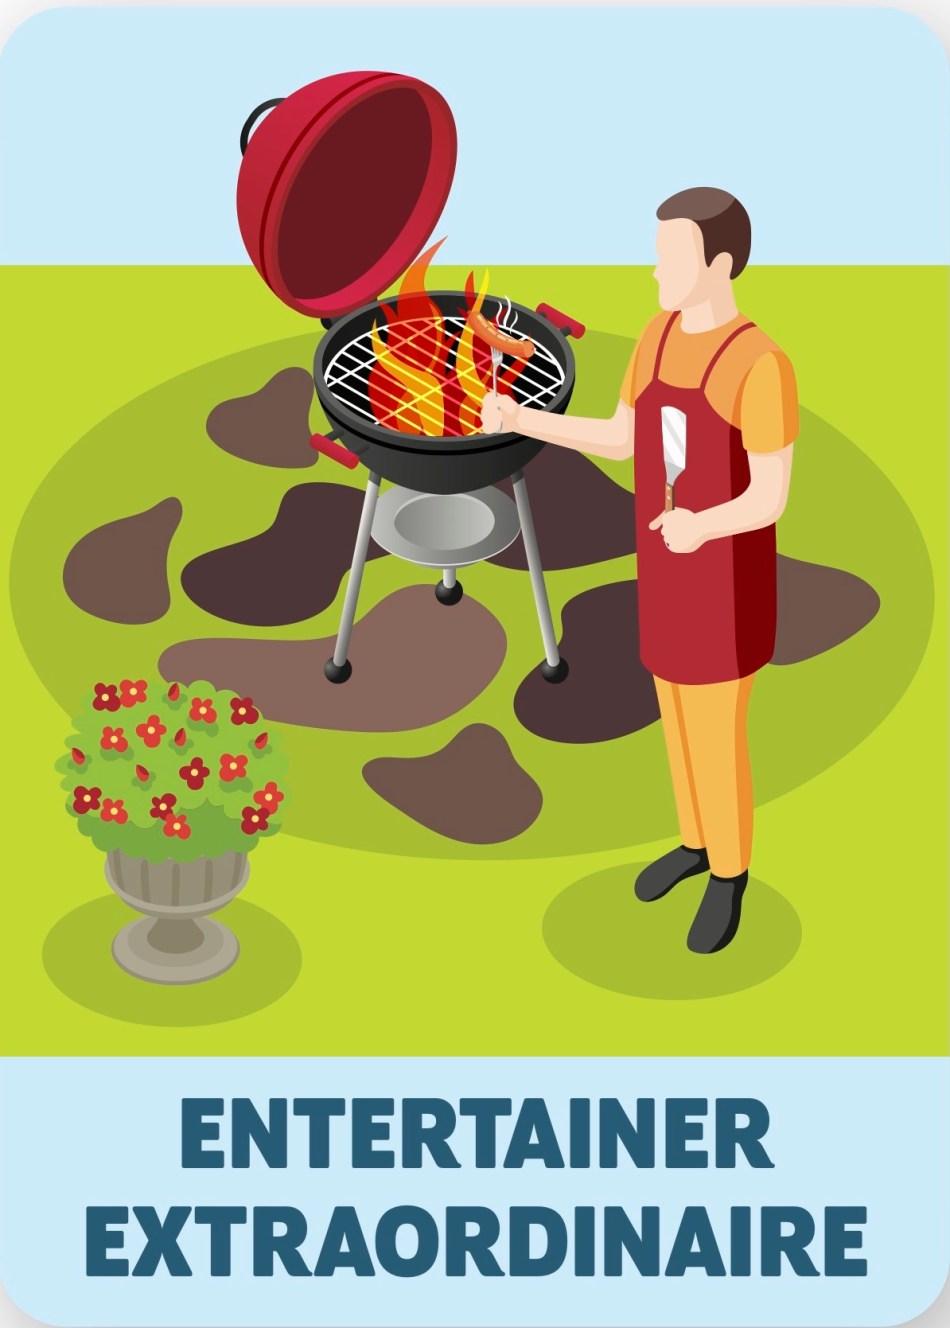 Illustration of entertainer